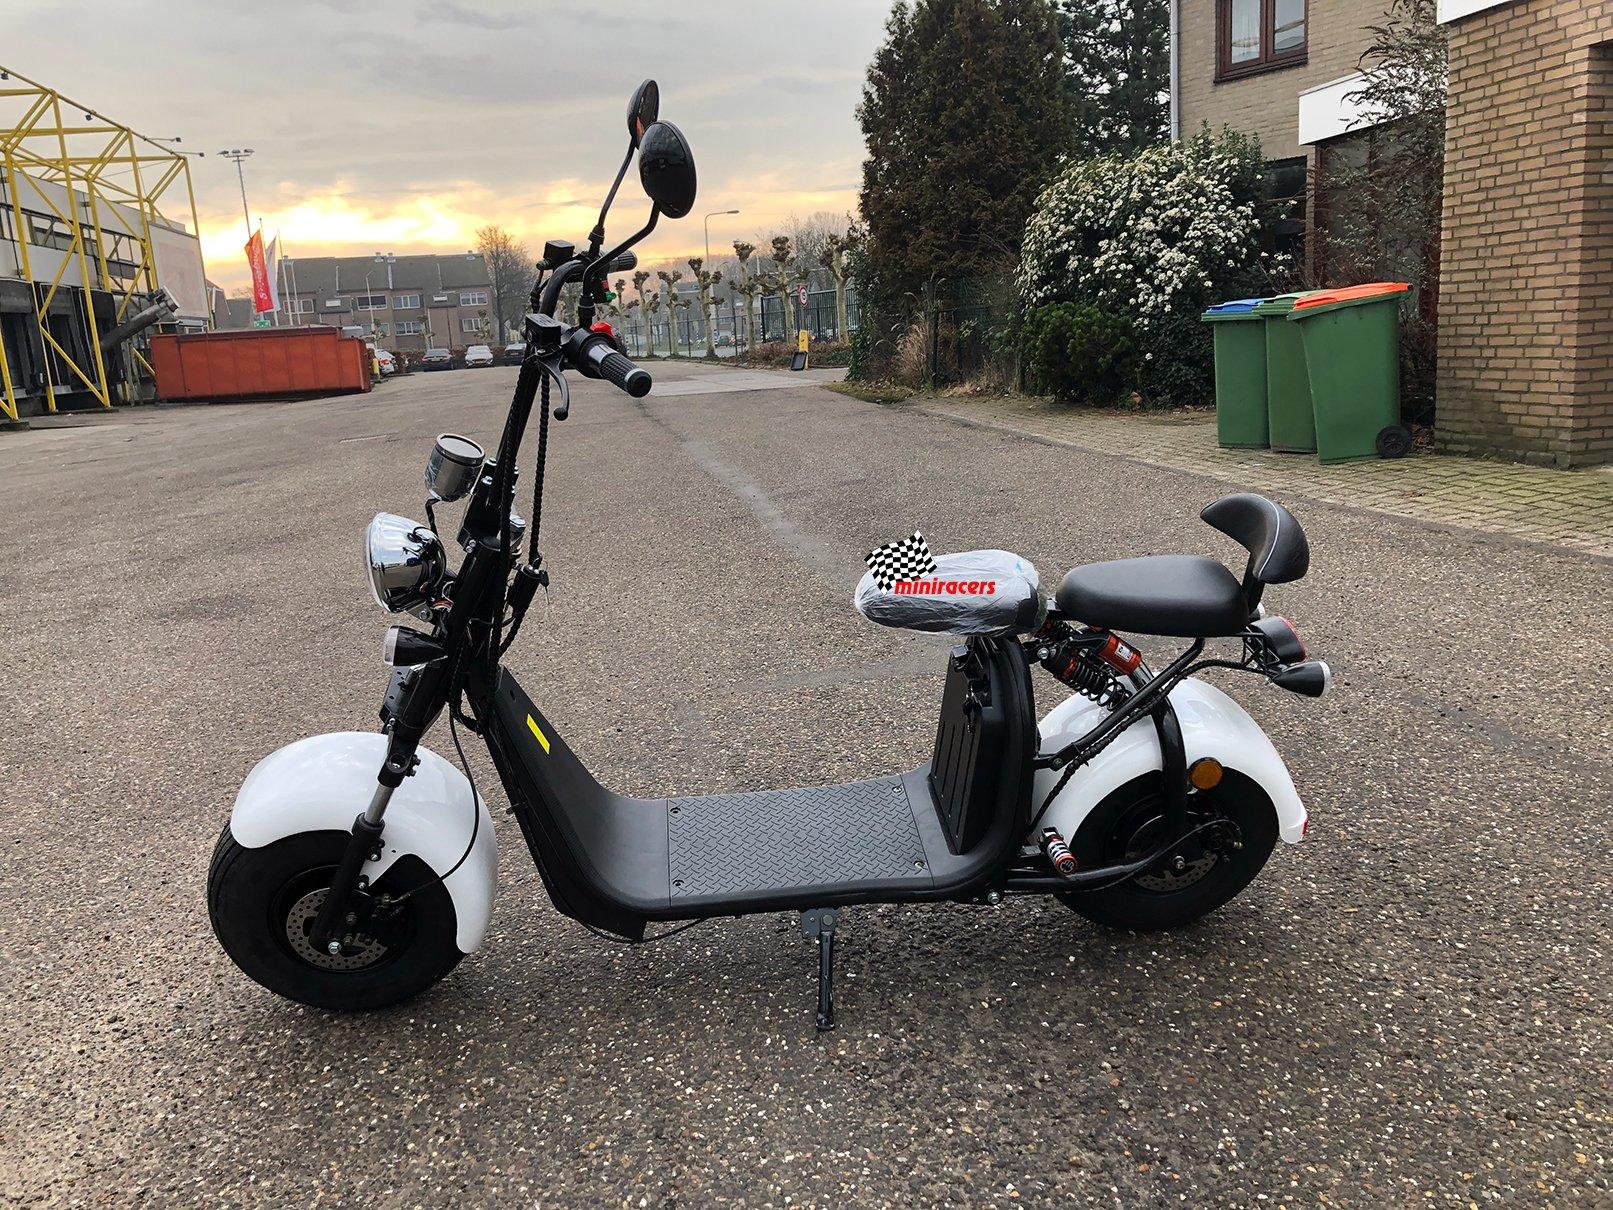 Verrassend Miniracers.nl - Welkom scooters scooter quads quad atv crossers SG-55